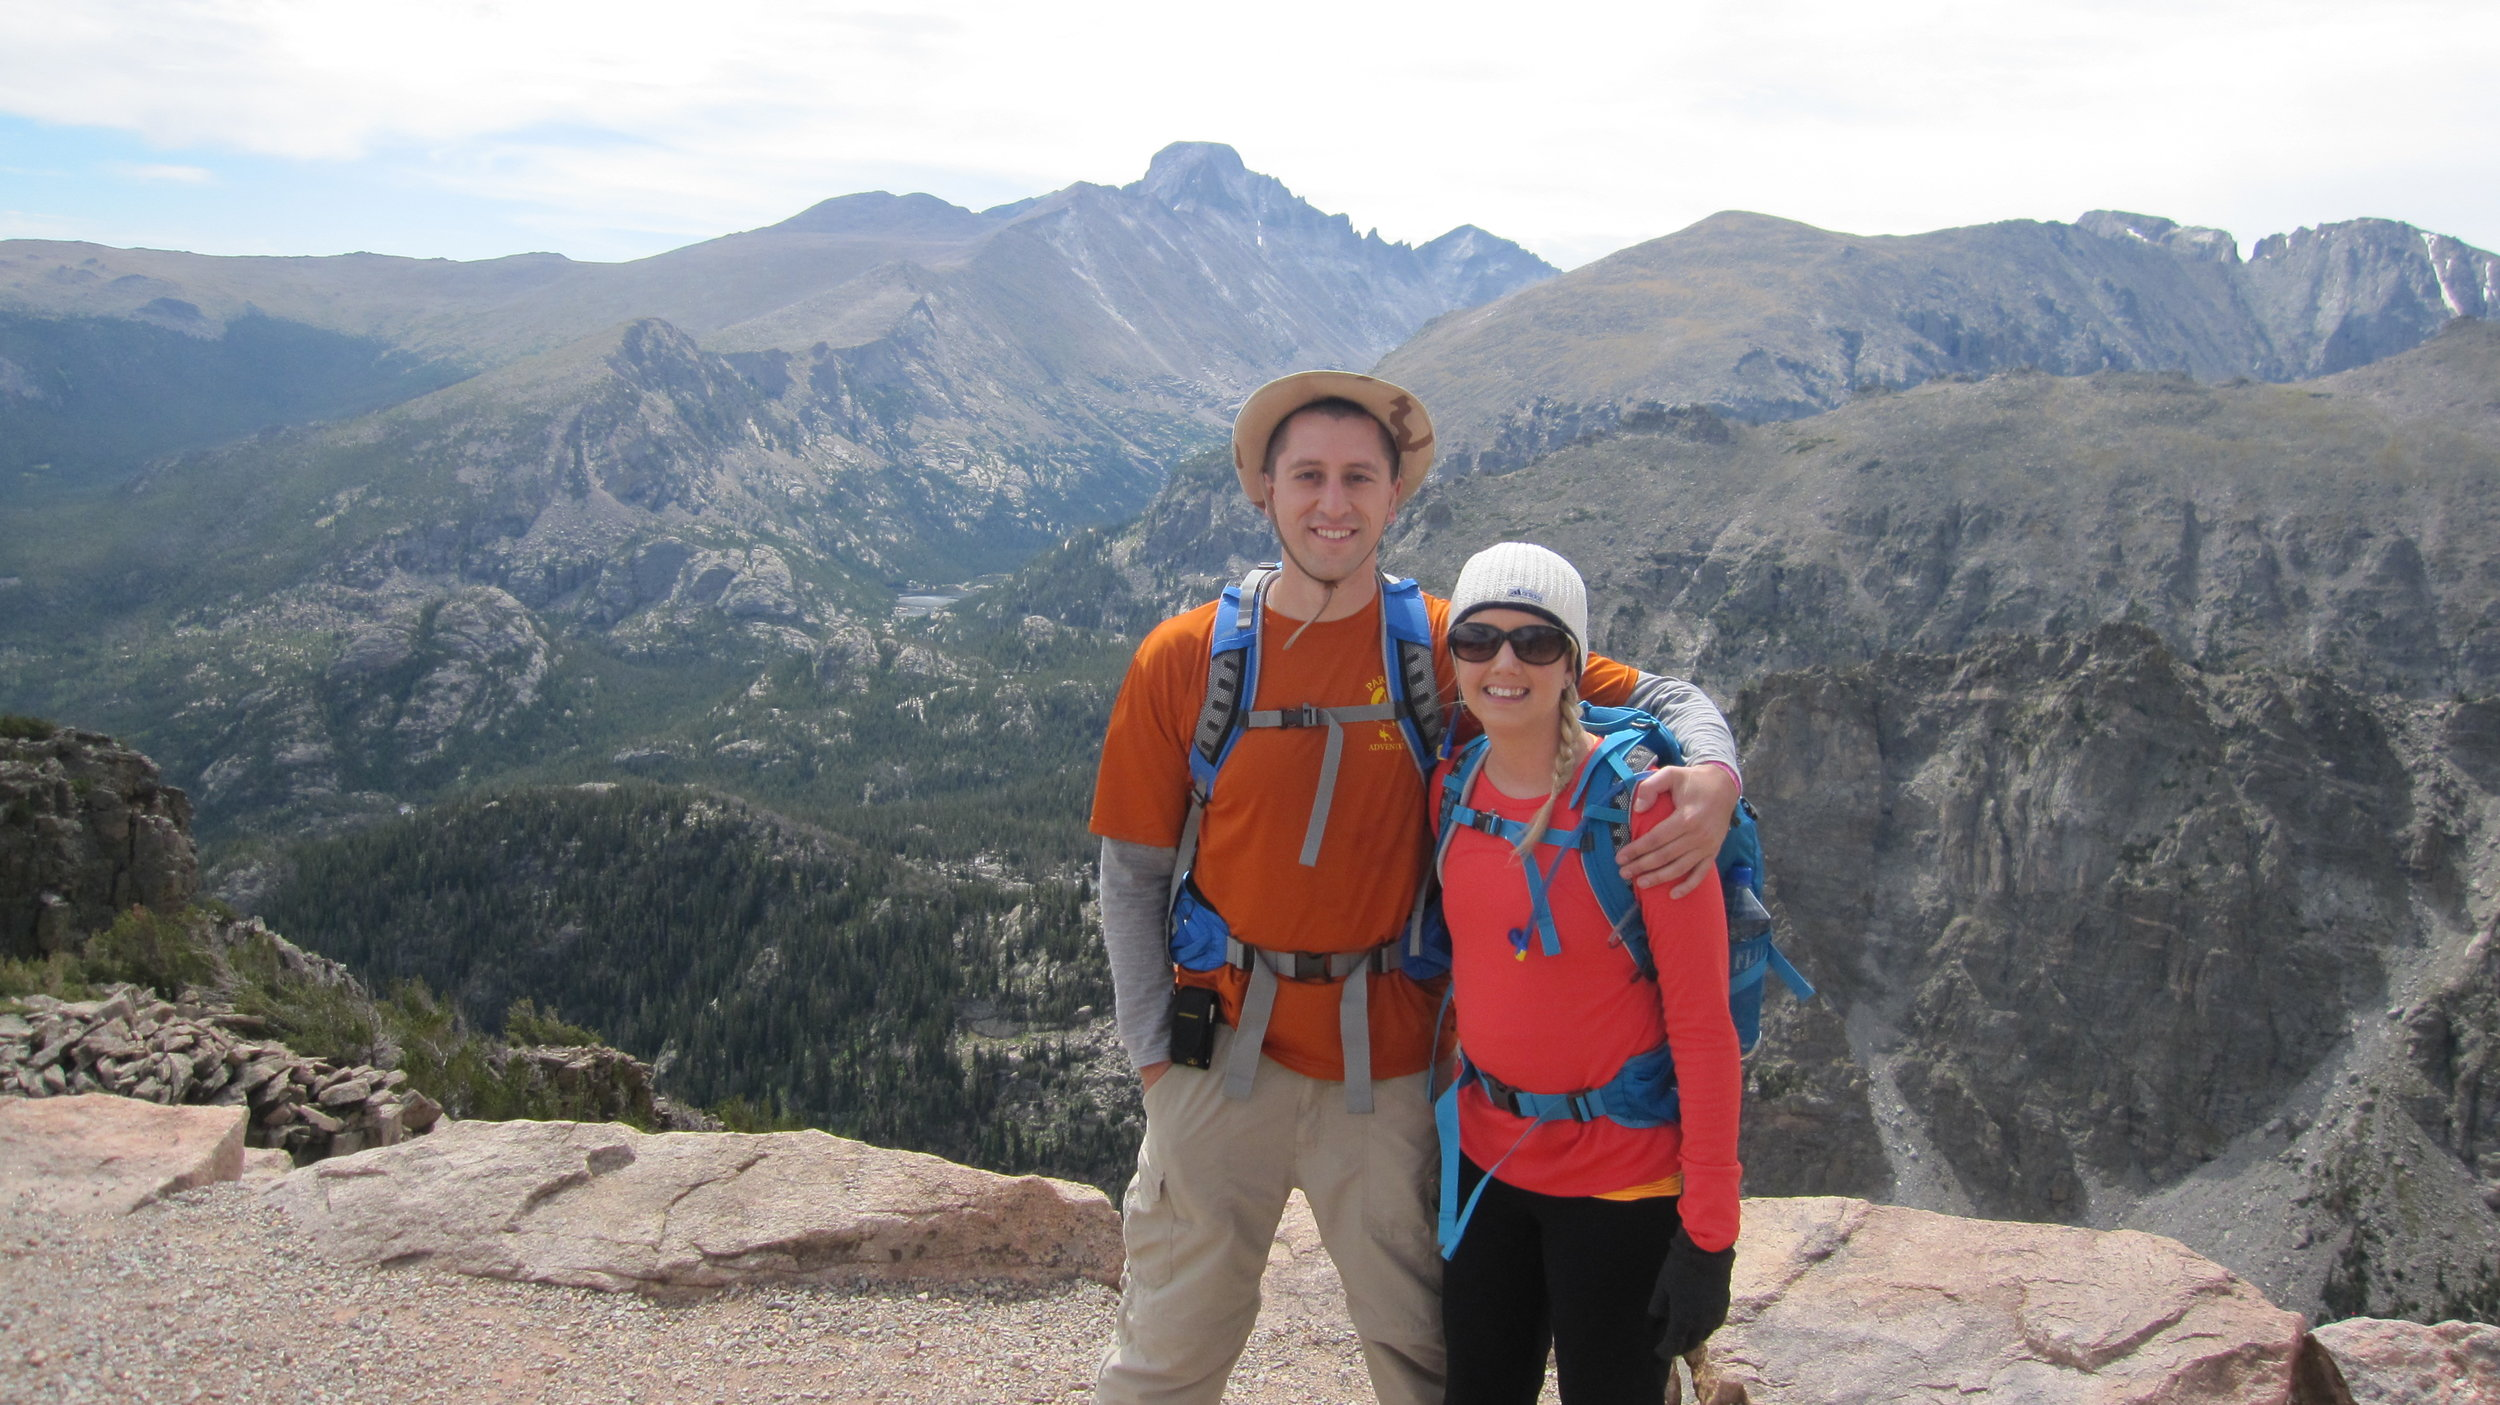 Bear Lake Trail, Rocky Mountain National Park, CO